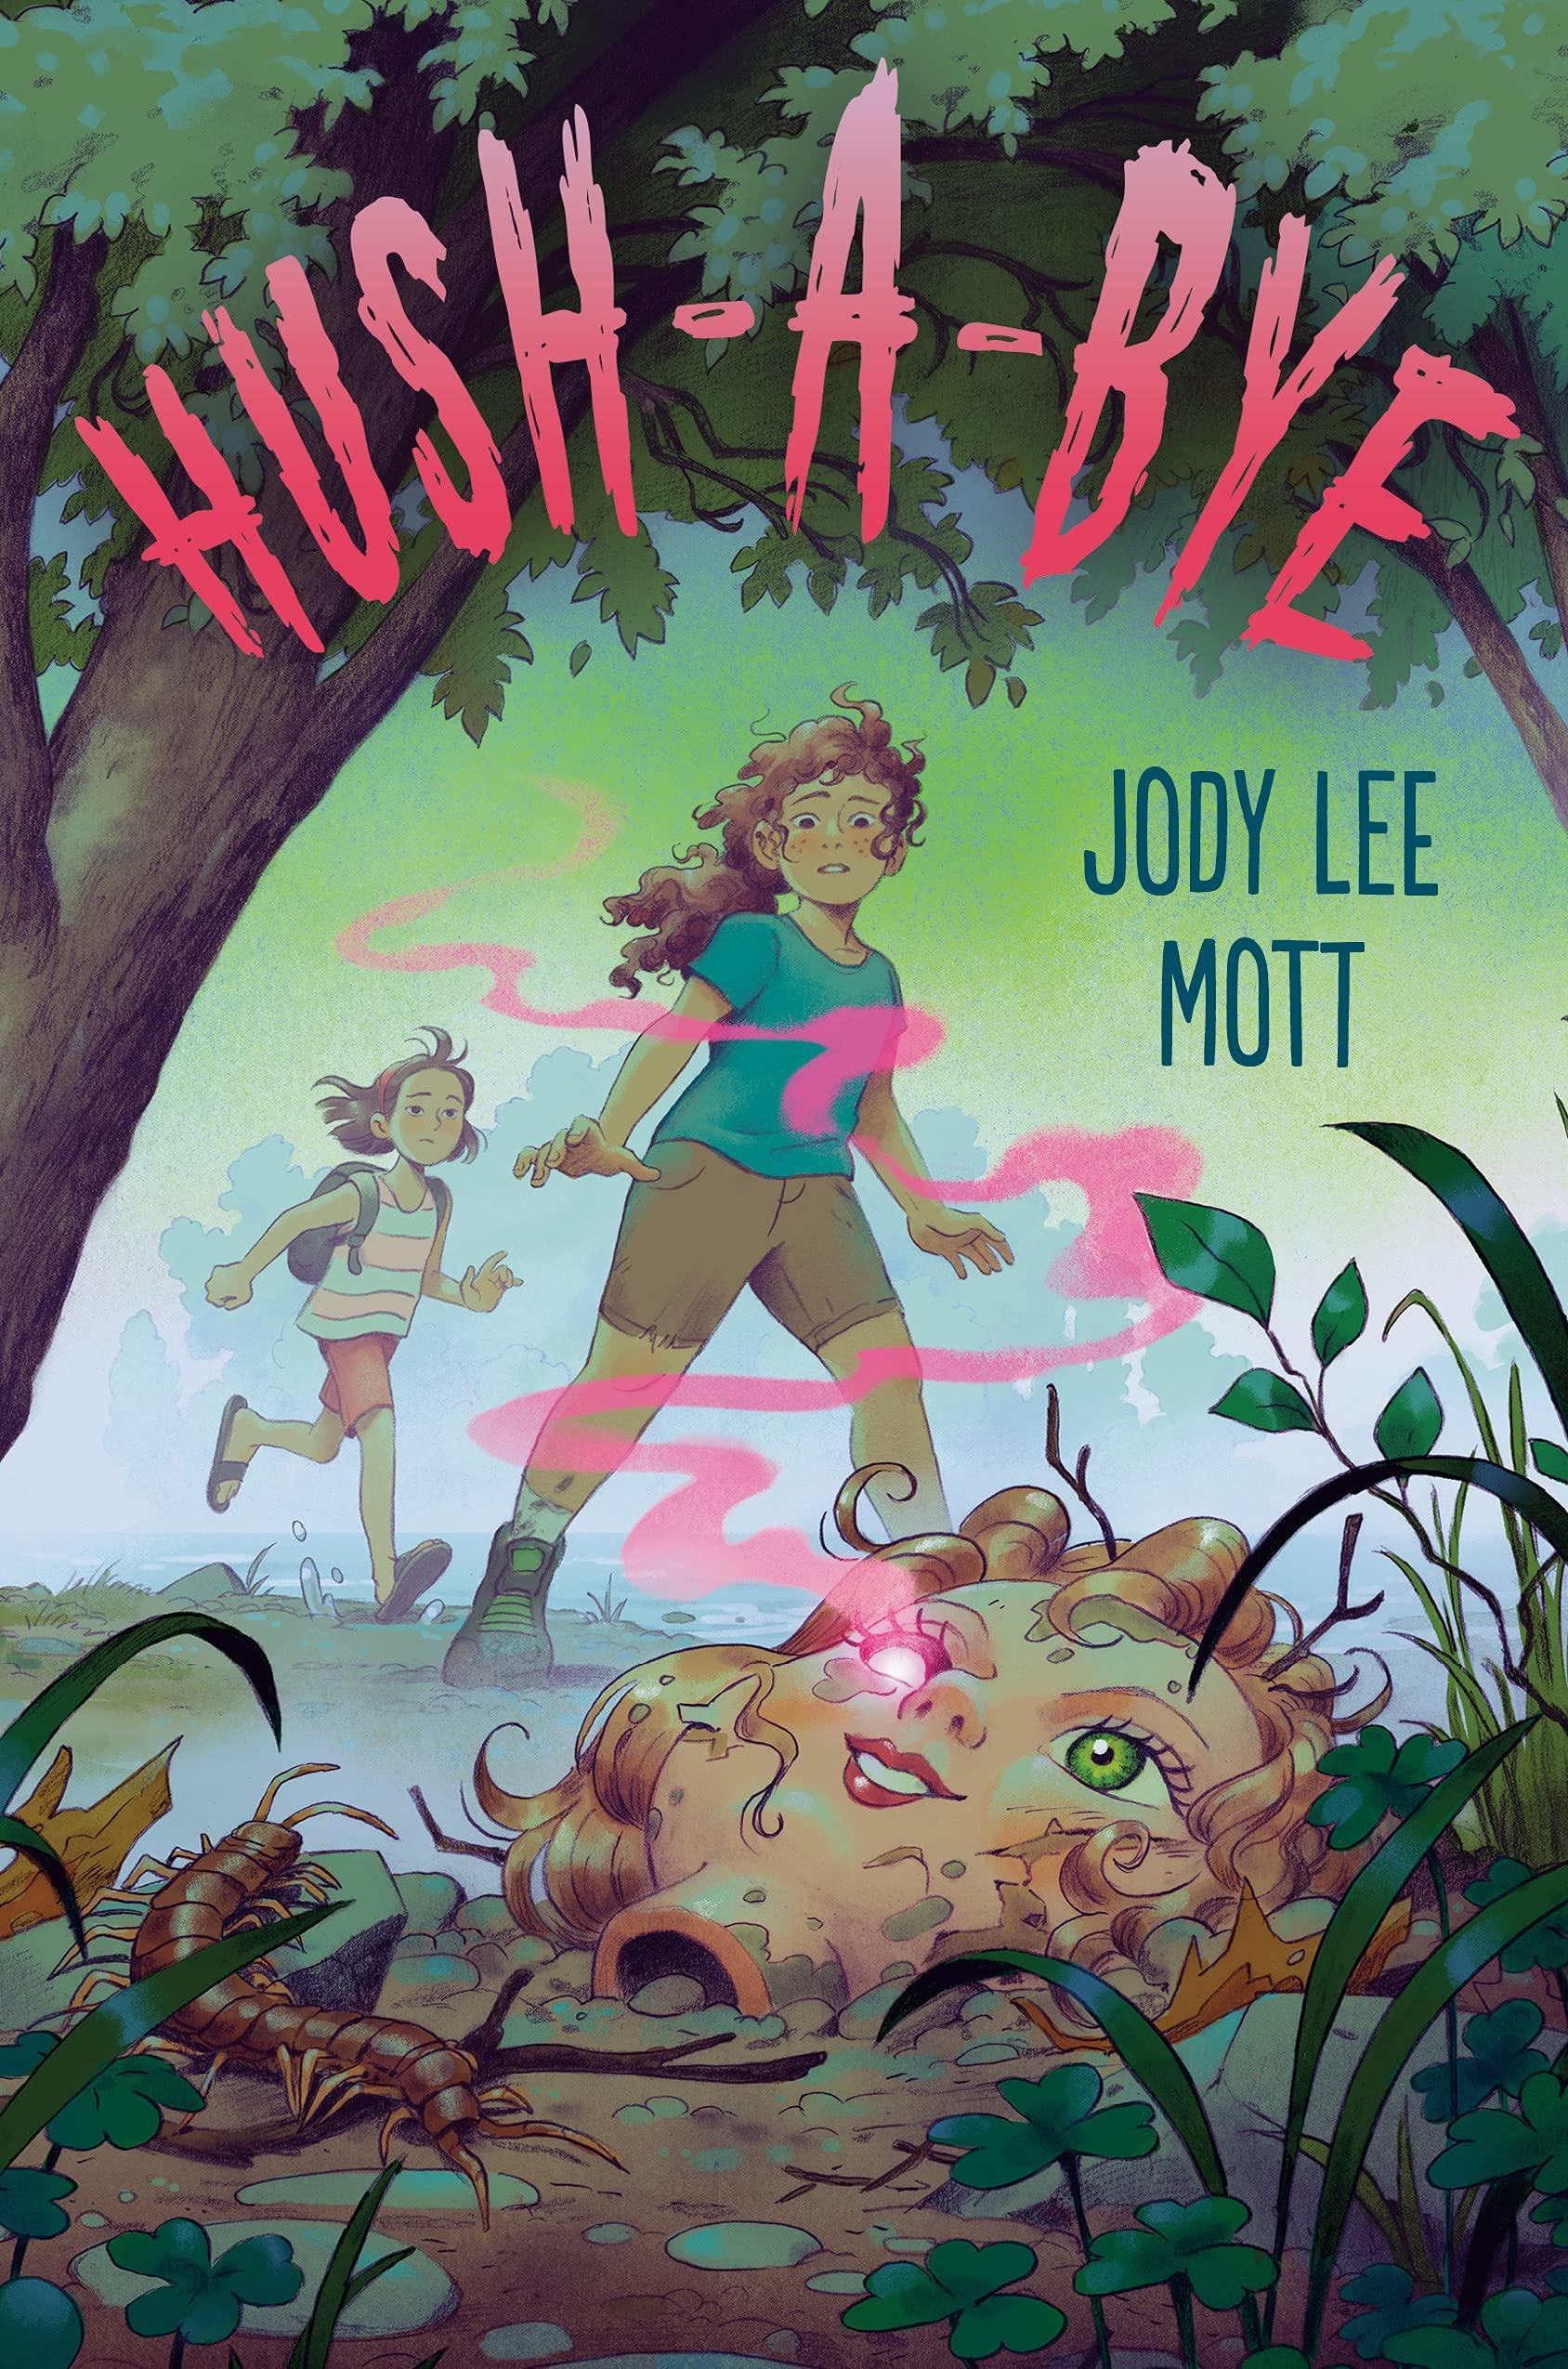 Hush-a-Bye: Mott, Jody Lee: 9780593206782: Amazon.com: Books